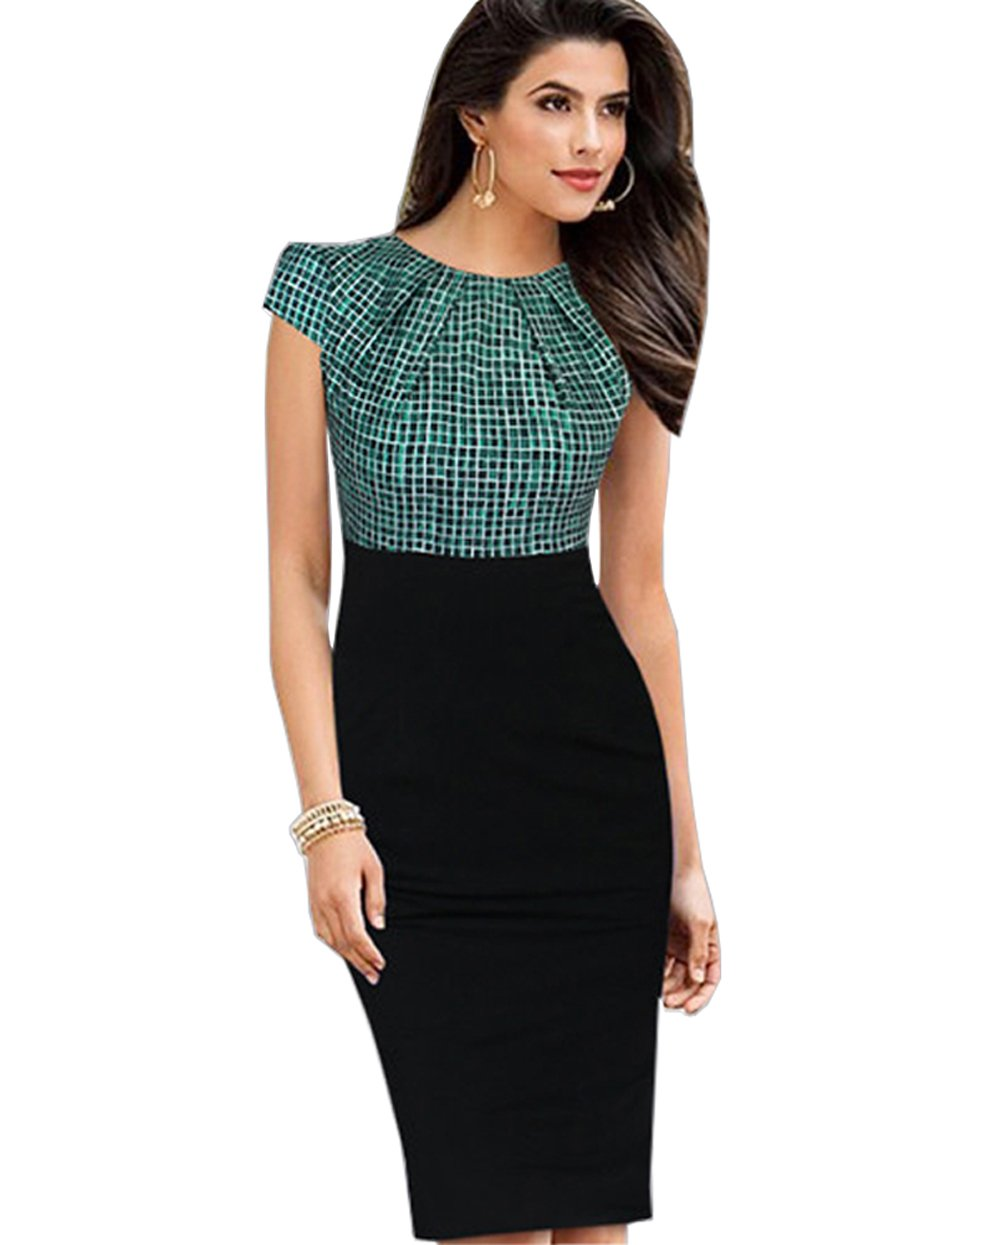 Merope J Womens Printed Ruffles Neck OL Pencil Contrasted Dress(M,Grenn Plaid + Black)